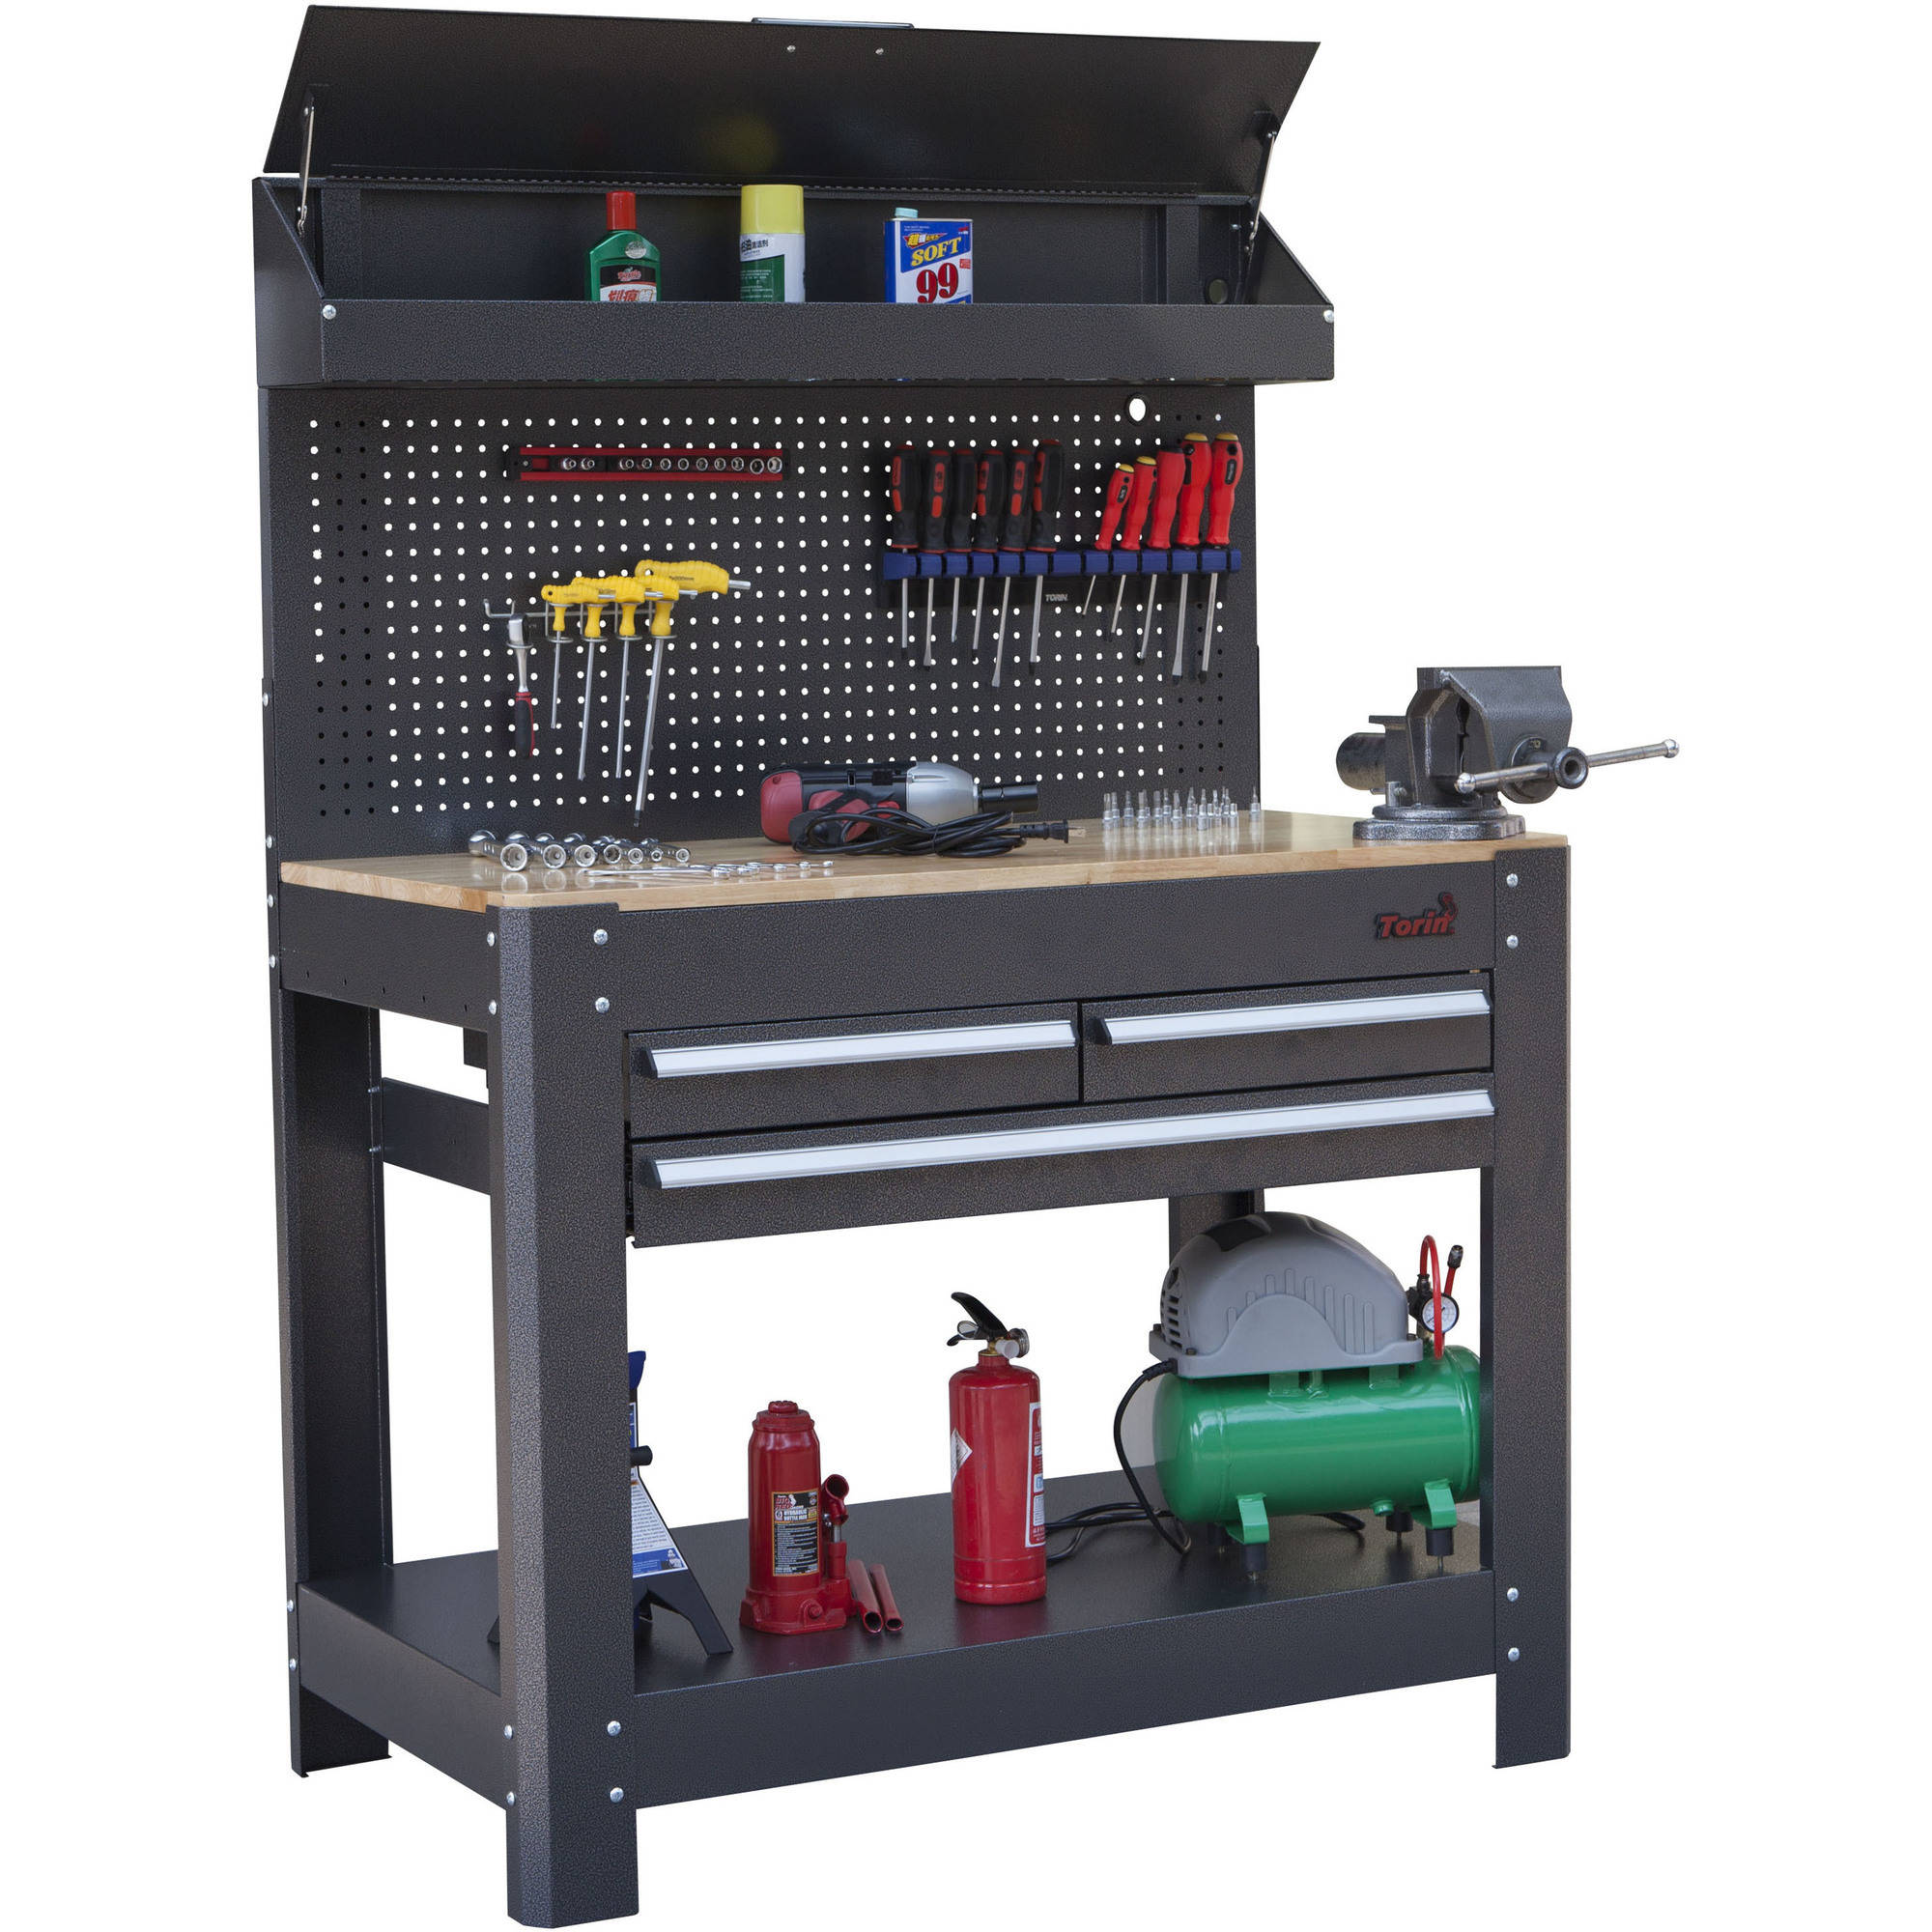 "Torin 45"" 3-Drawer Workbench"